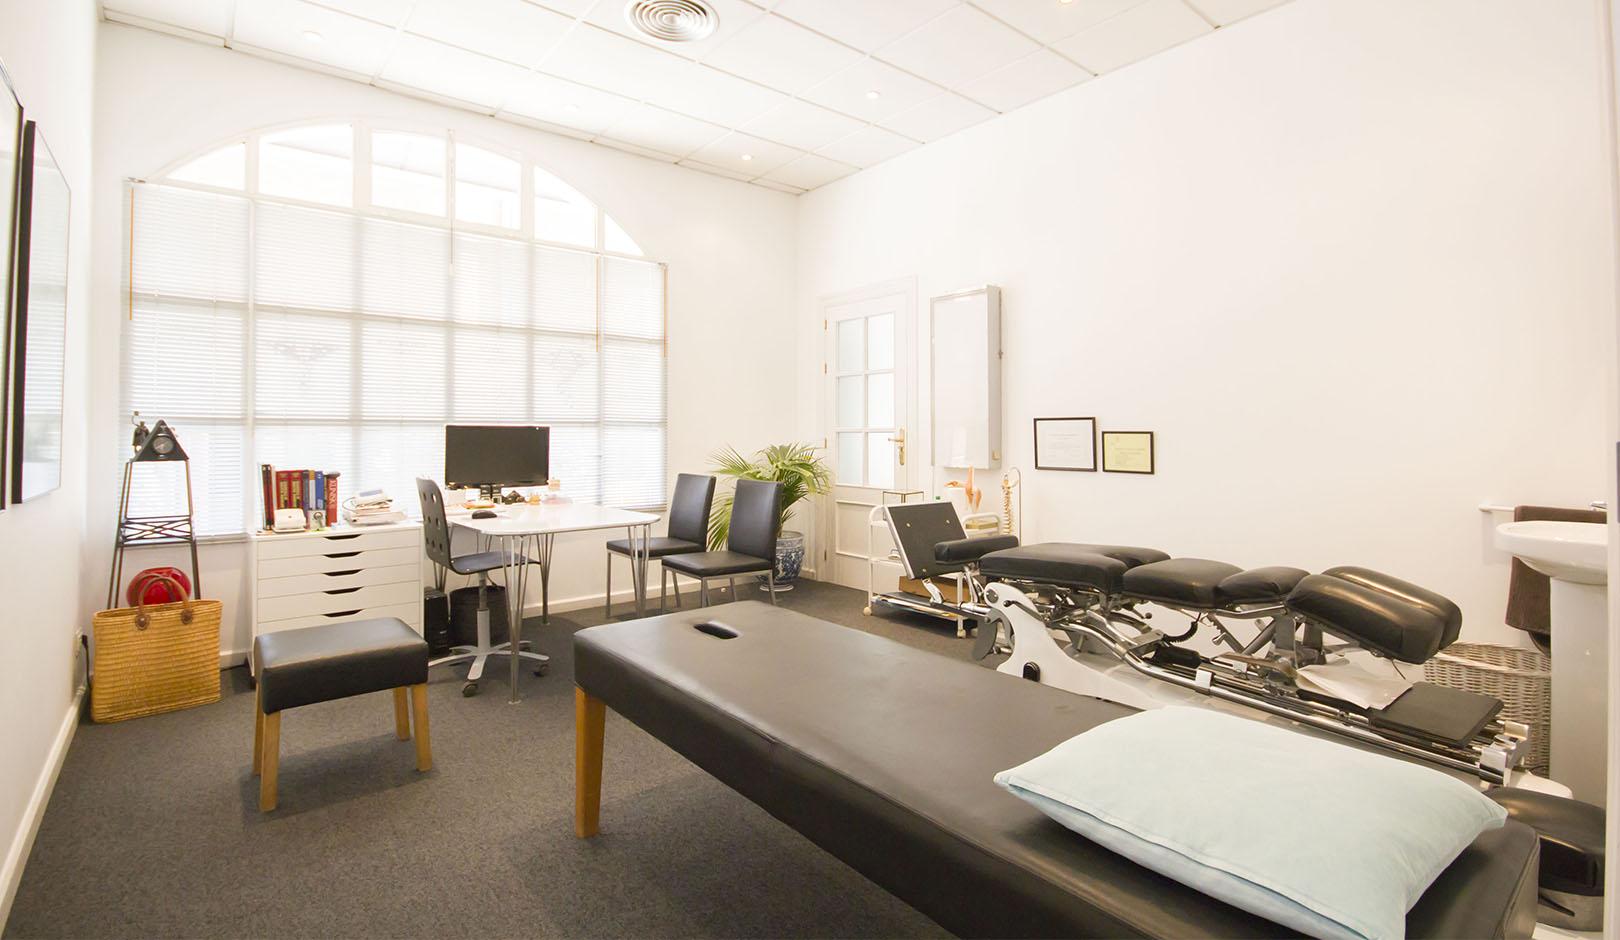 Centro Quiropractico Mogens Dahl